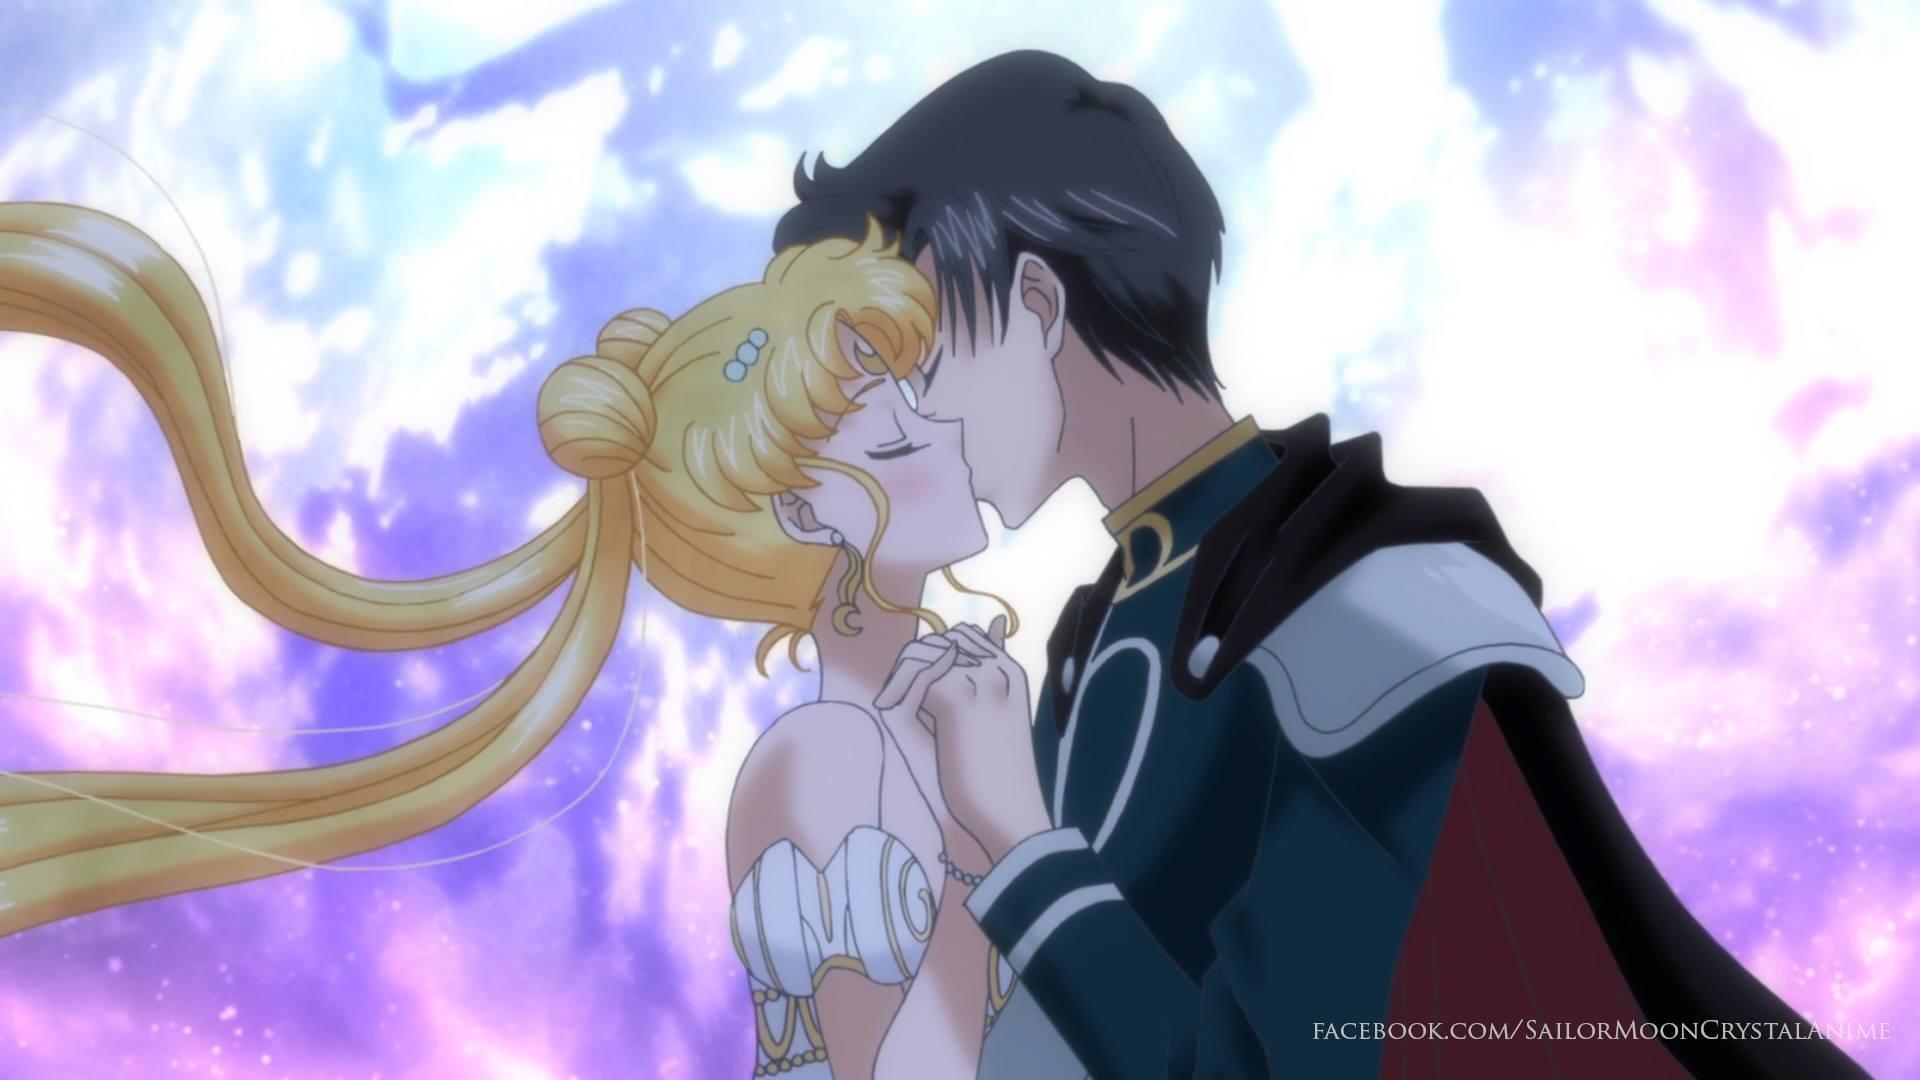 Princess Serenity and Prince Endymion – Sailor Moon Crystal